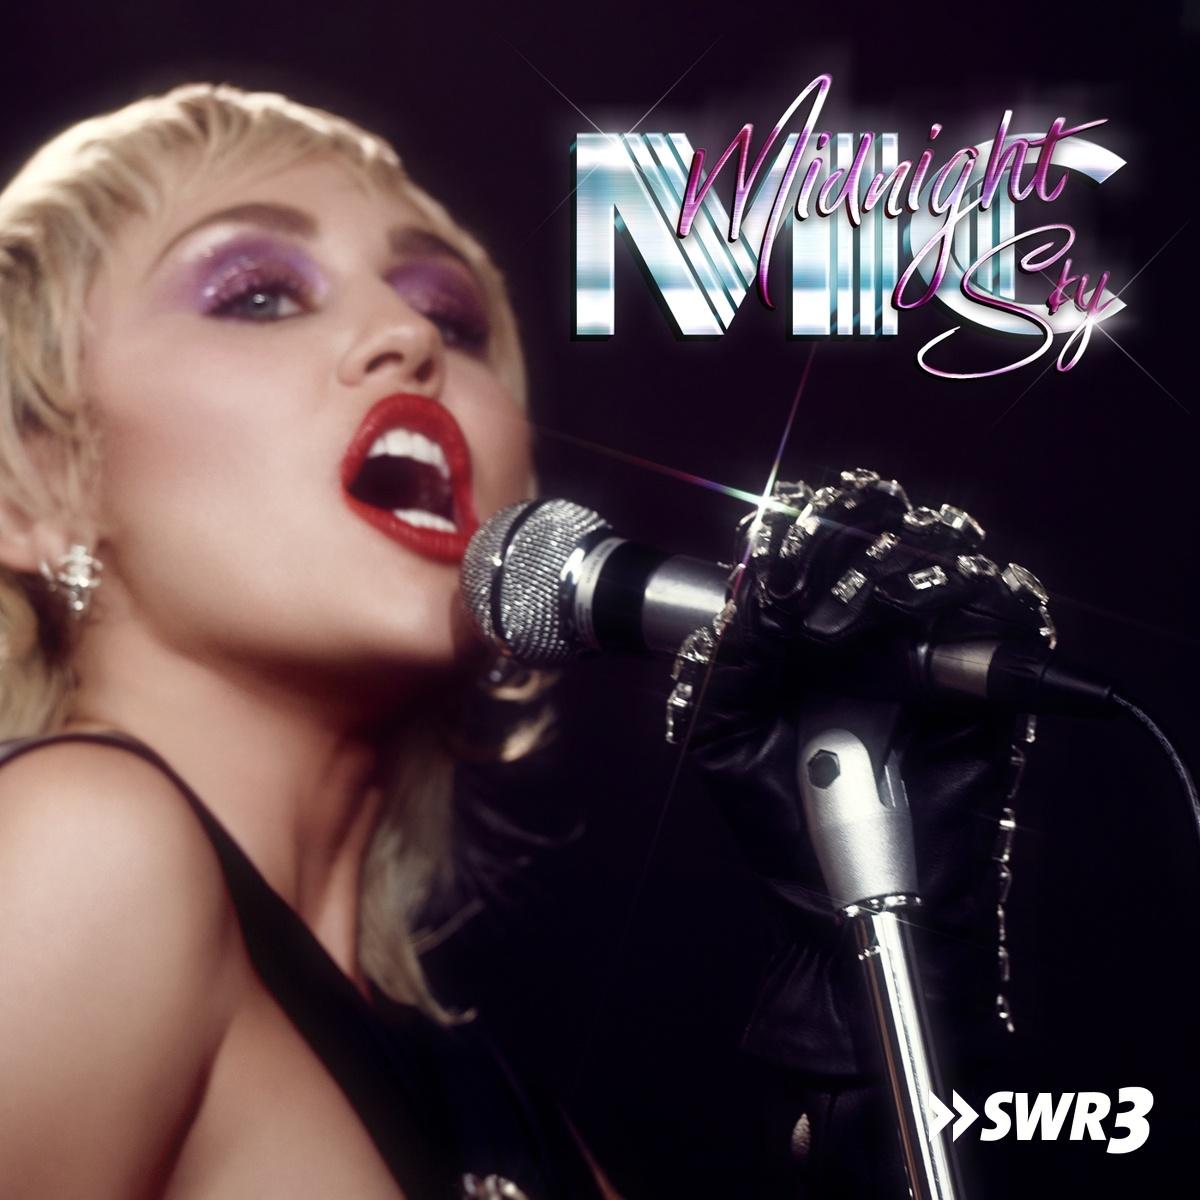 Midnight sky (Foto: Miley Cyrus)